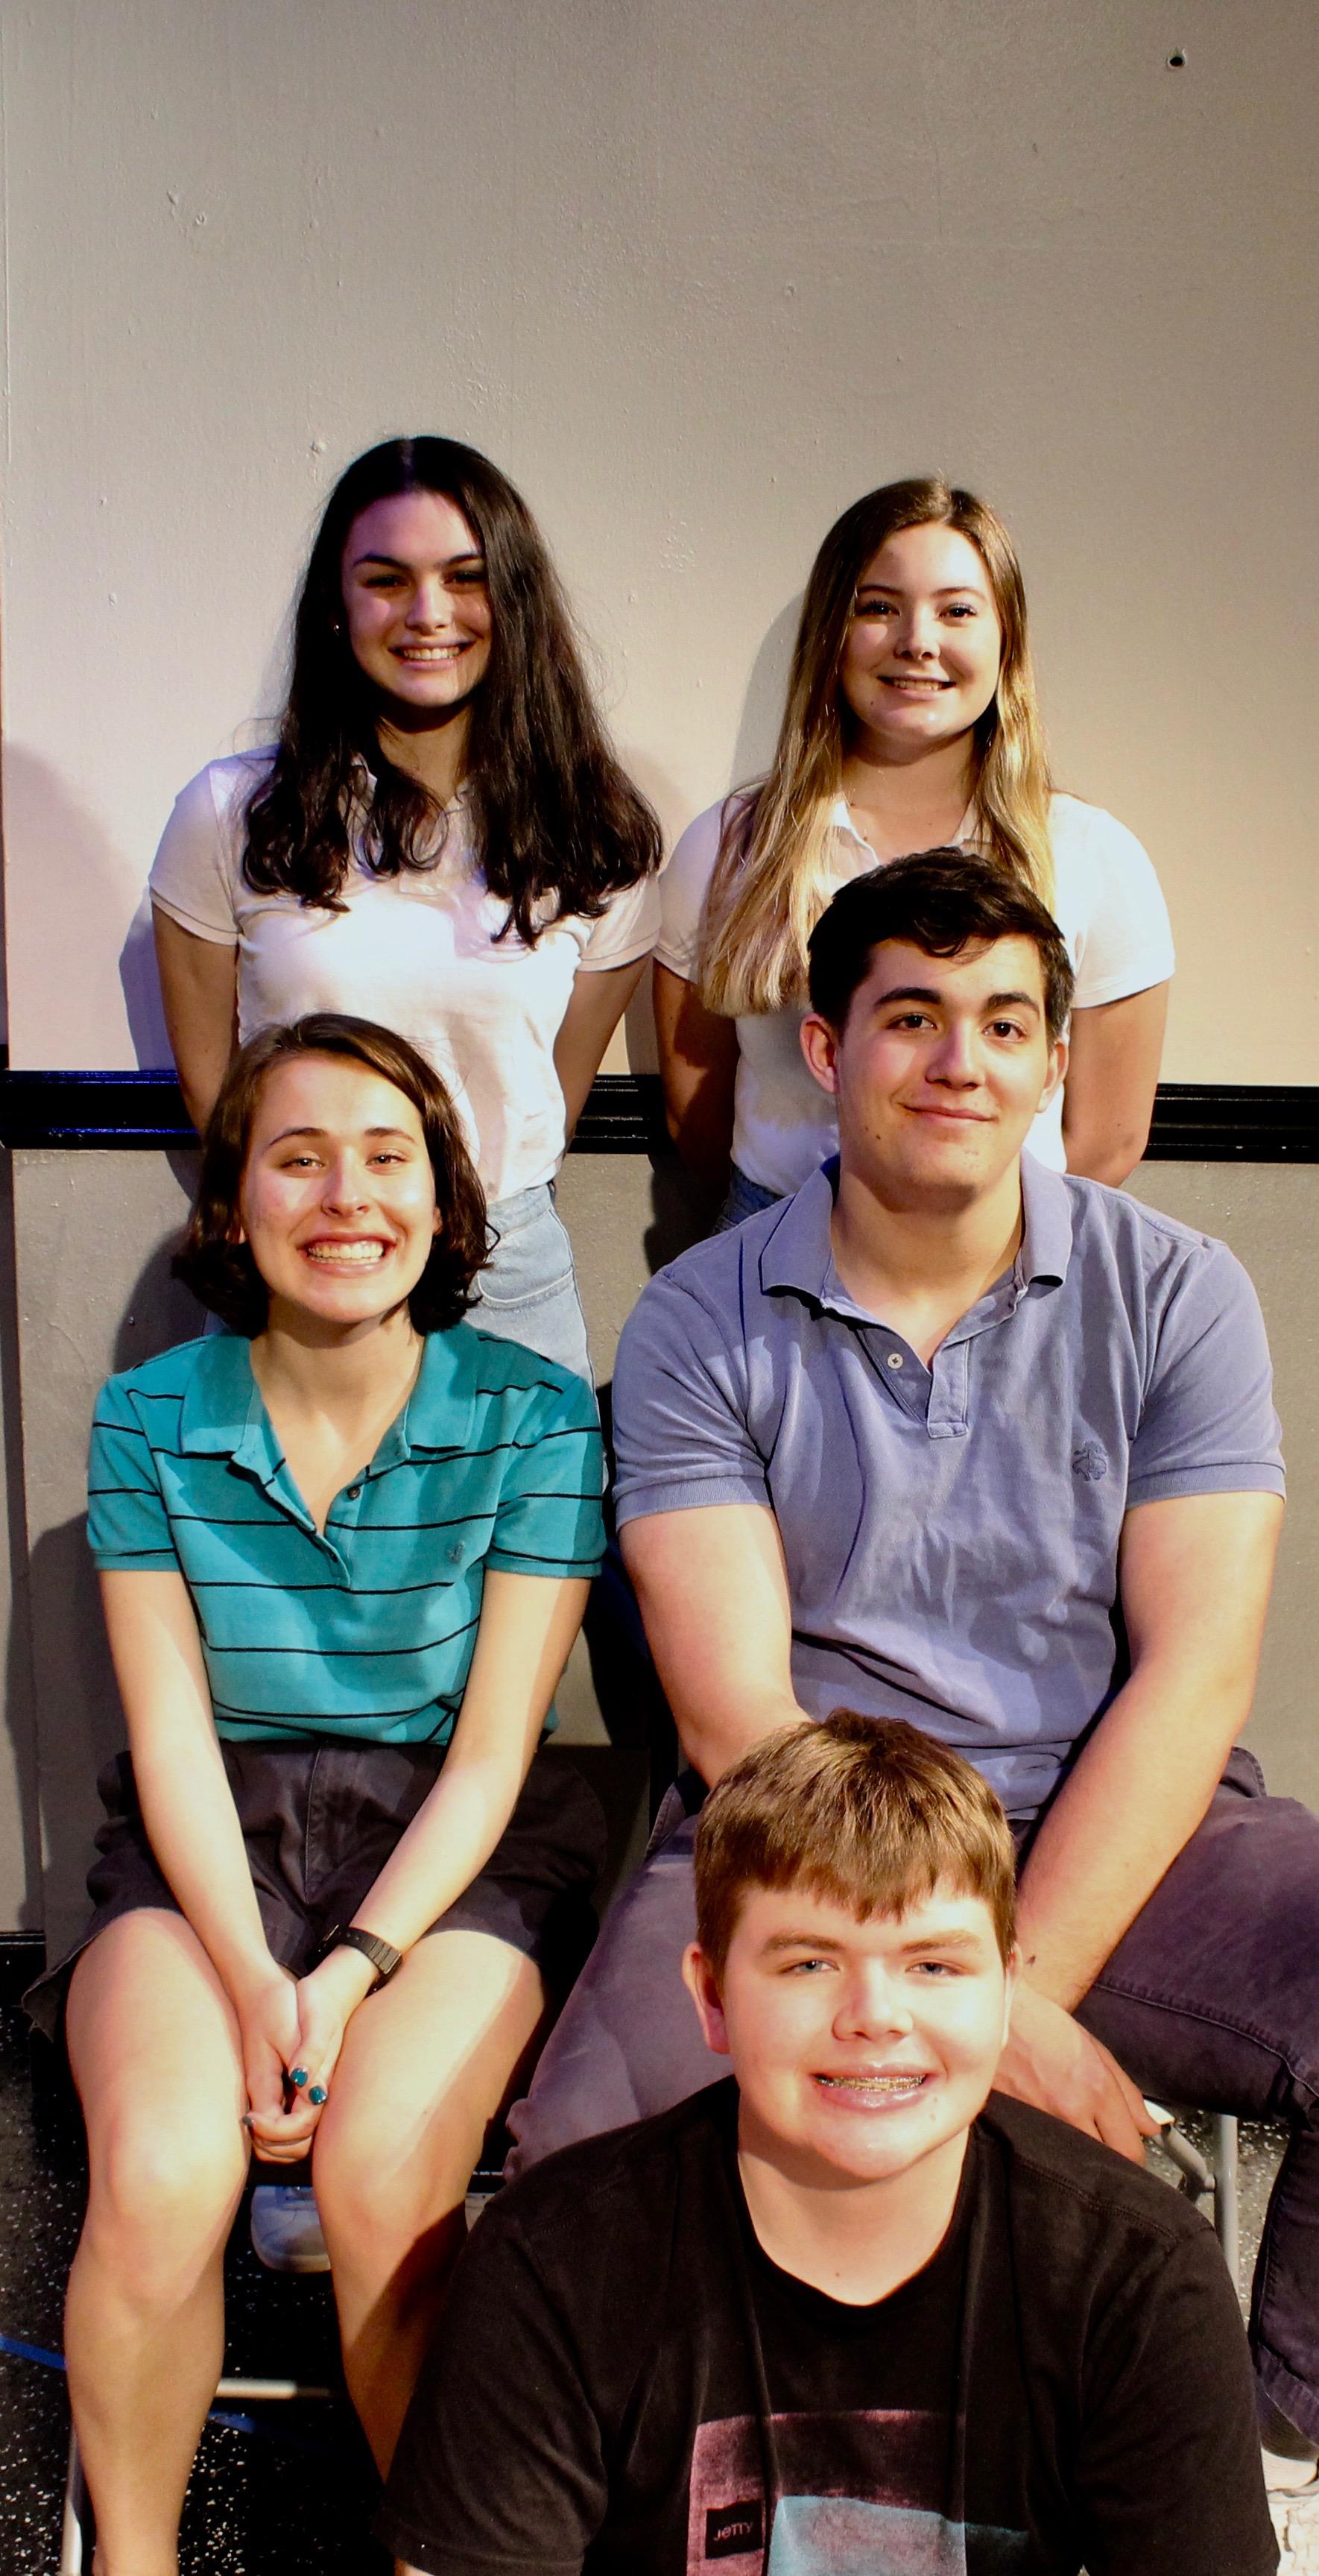 Clockwise from top left: Casey Rae Borella as Kiki, Caitlin Ladda as Sarah, Liam Gerard as Martin, Patrick Napolitano as Kurtz, Katie Kunka as Loony